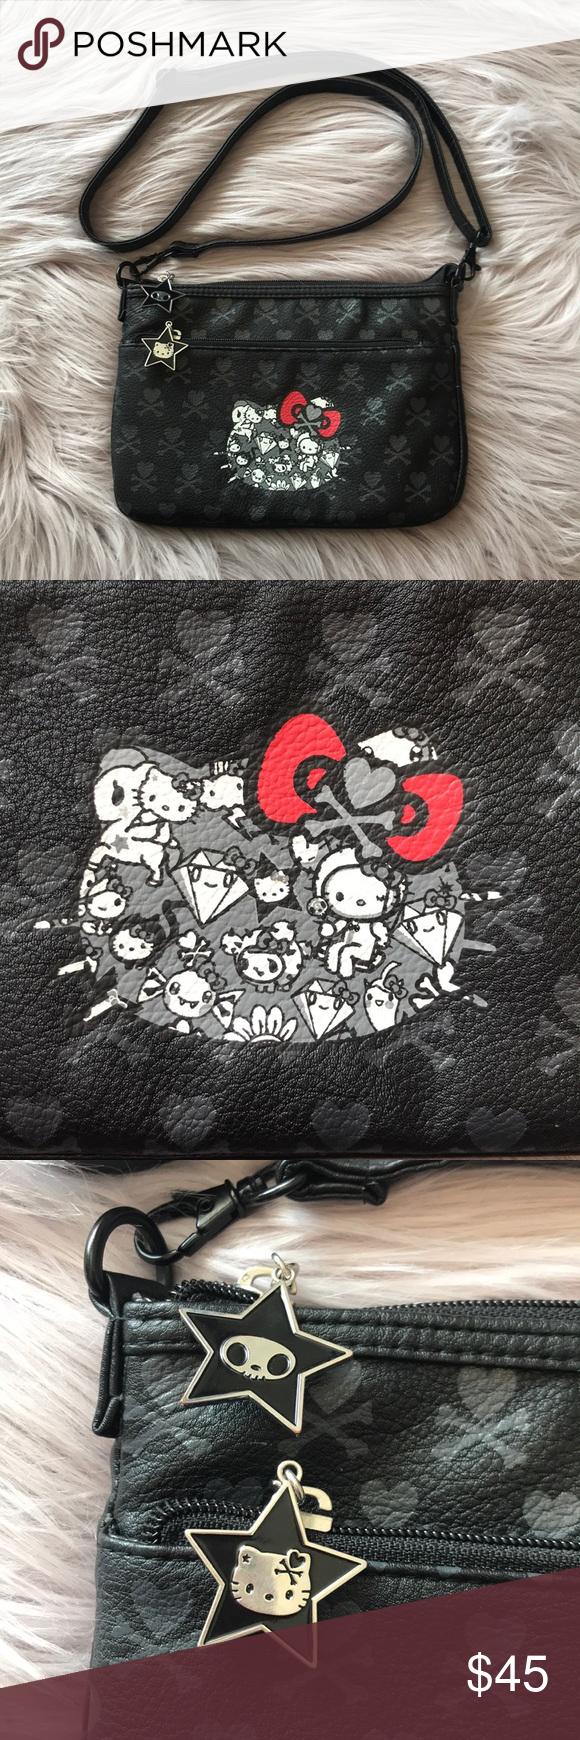 f8f3512d5fc3 Spotted while shopping on Poshmark  Tokidoki Hello Kitty Crossbody Bag  Handbag Purse!  poshmark